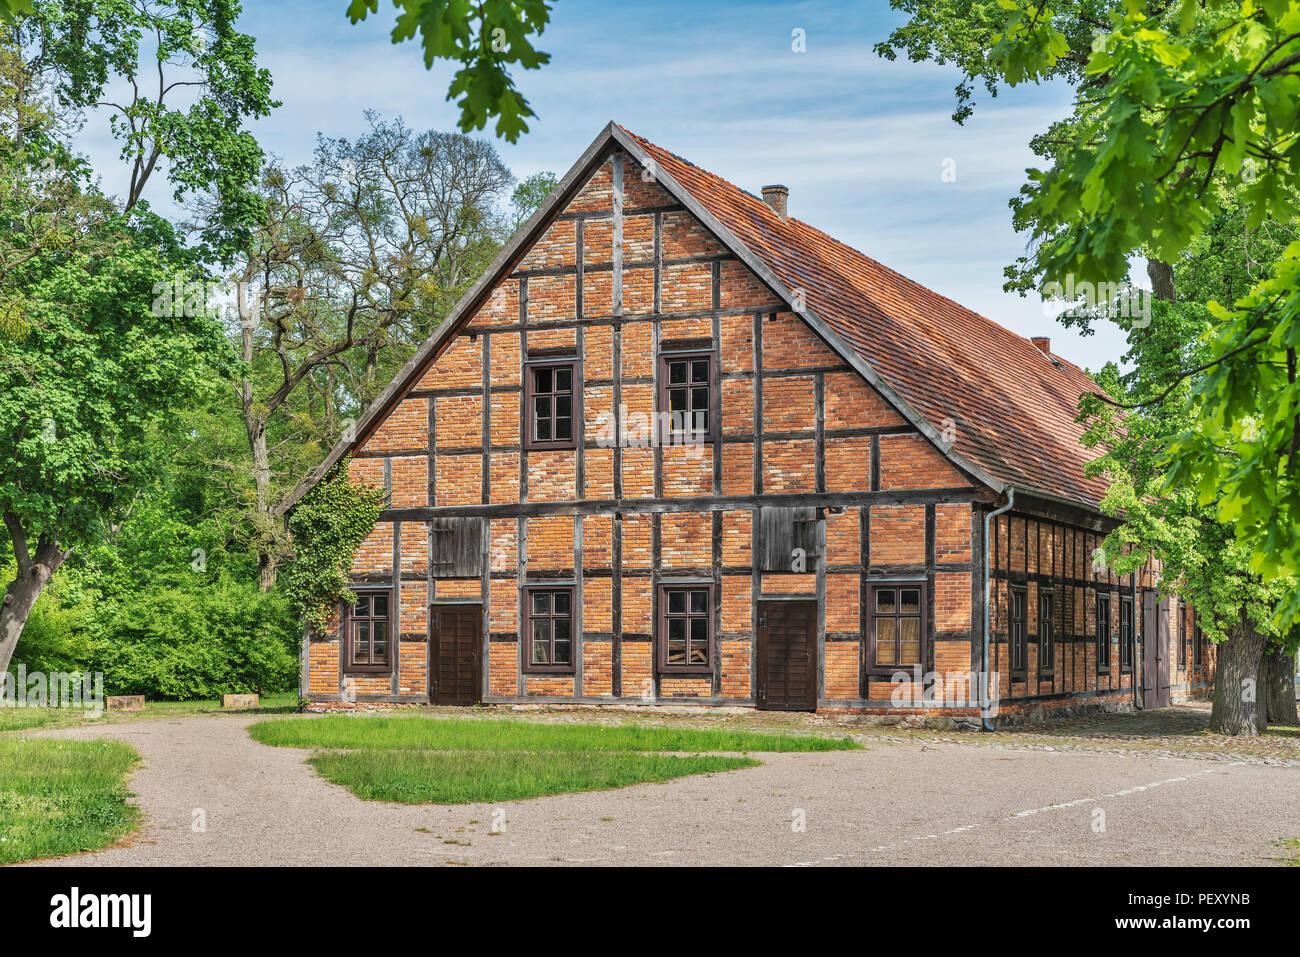 Old Glashuette building in the museum village Baruther Glashuette, Baruth/Mark, Brandenburg, Germany - Stock Image